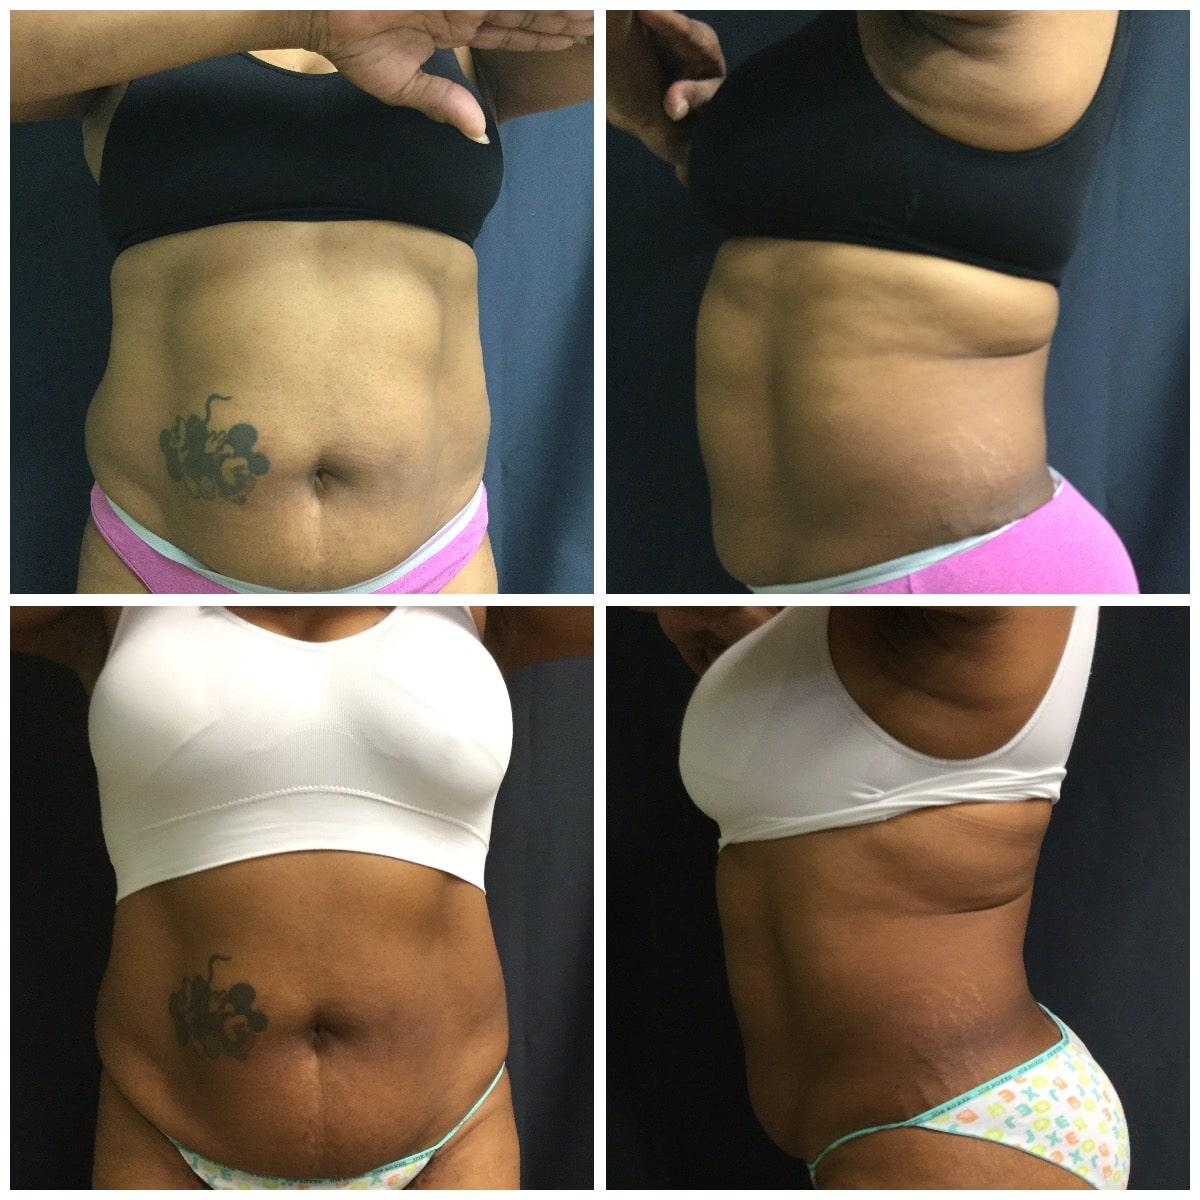 Fat Removal Treatment in Kenosha, laser fat removal, sculpsure kenosha